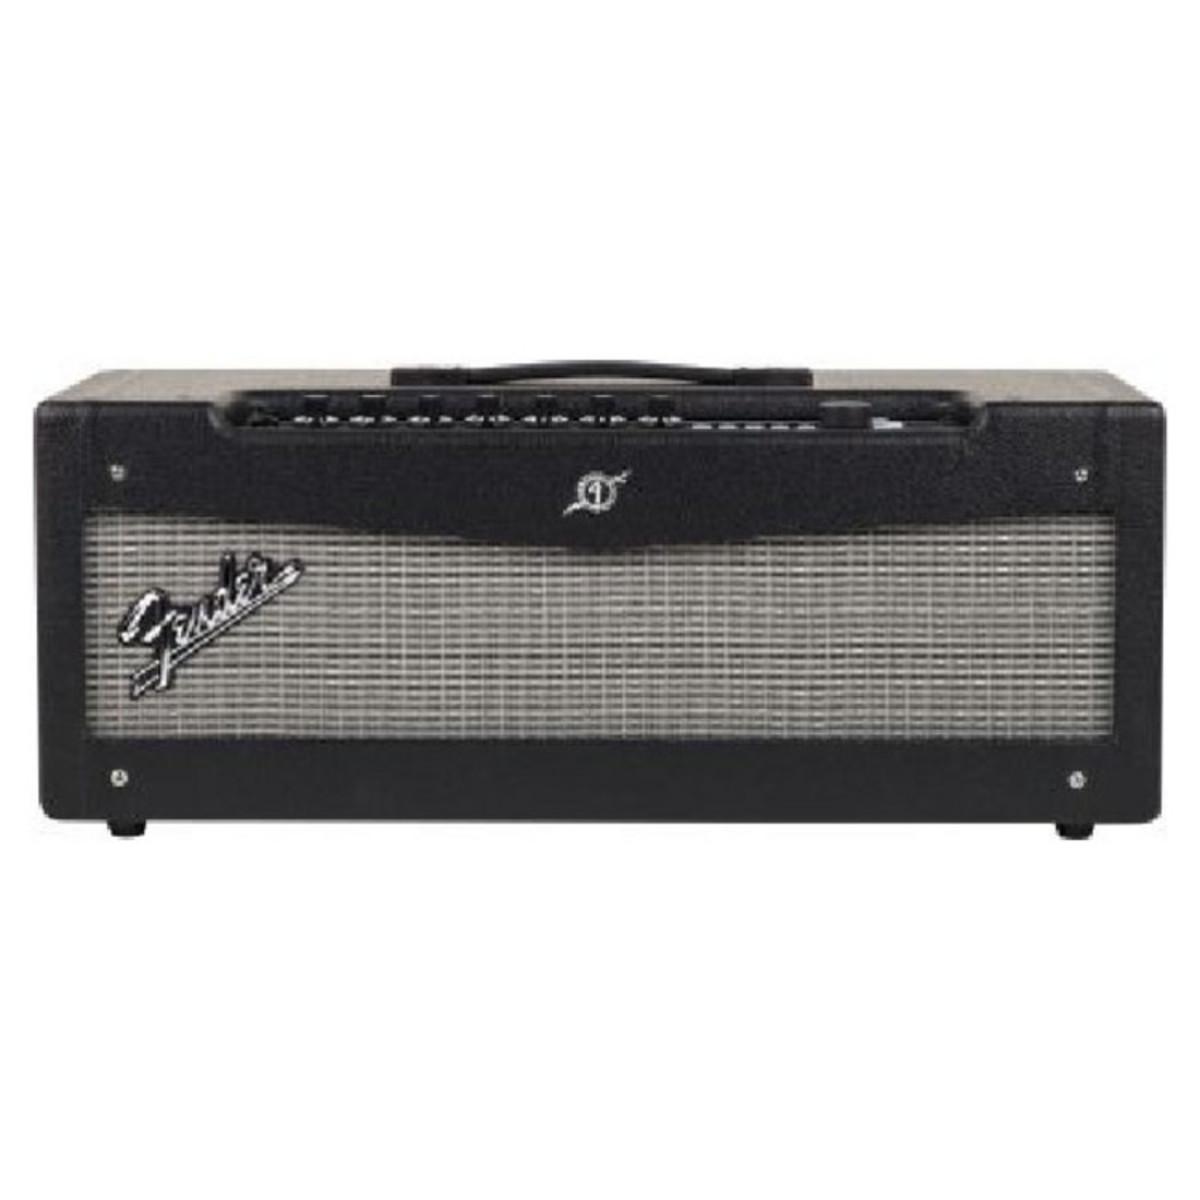 DISC Fender Mustang V (V 2) Guitar Amp Head